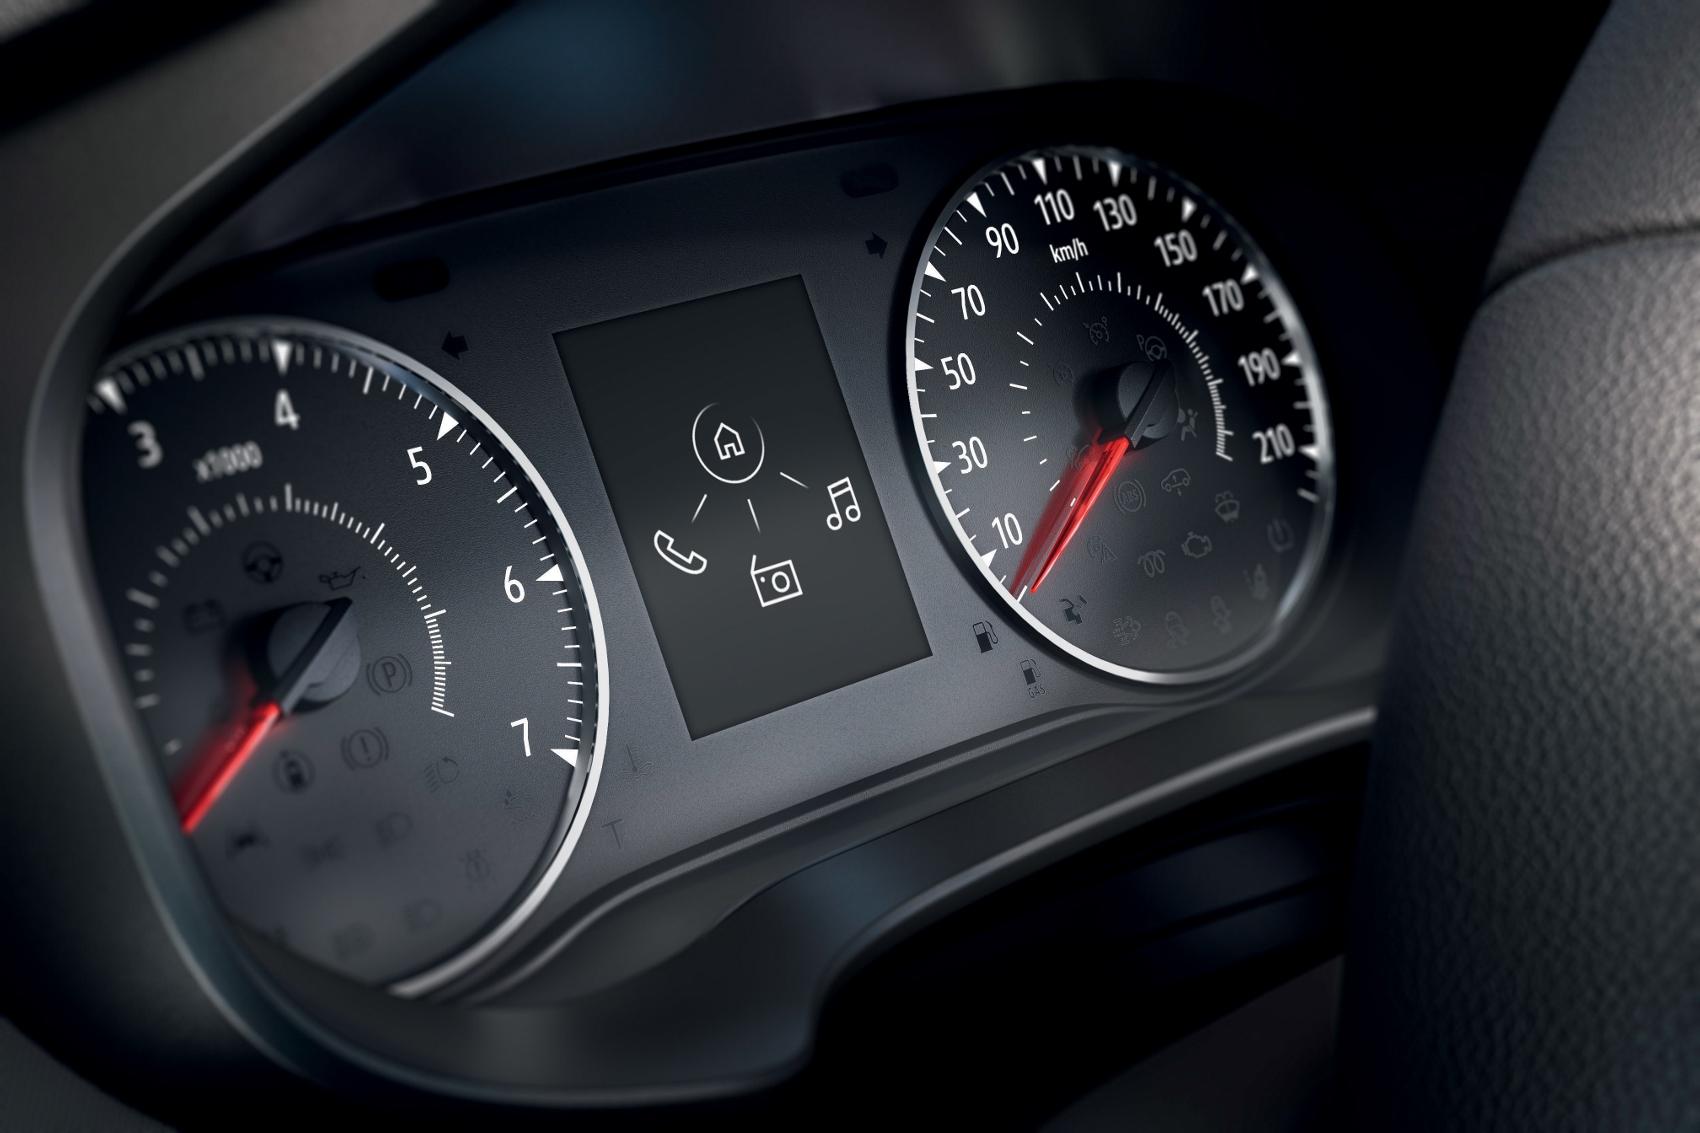 2020 - New Dacia SANDERO (8) (1700x1133)